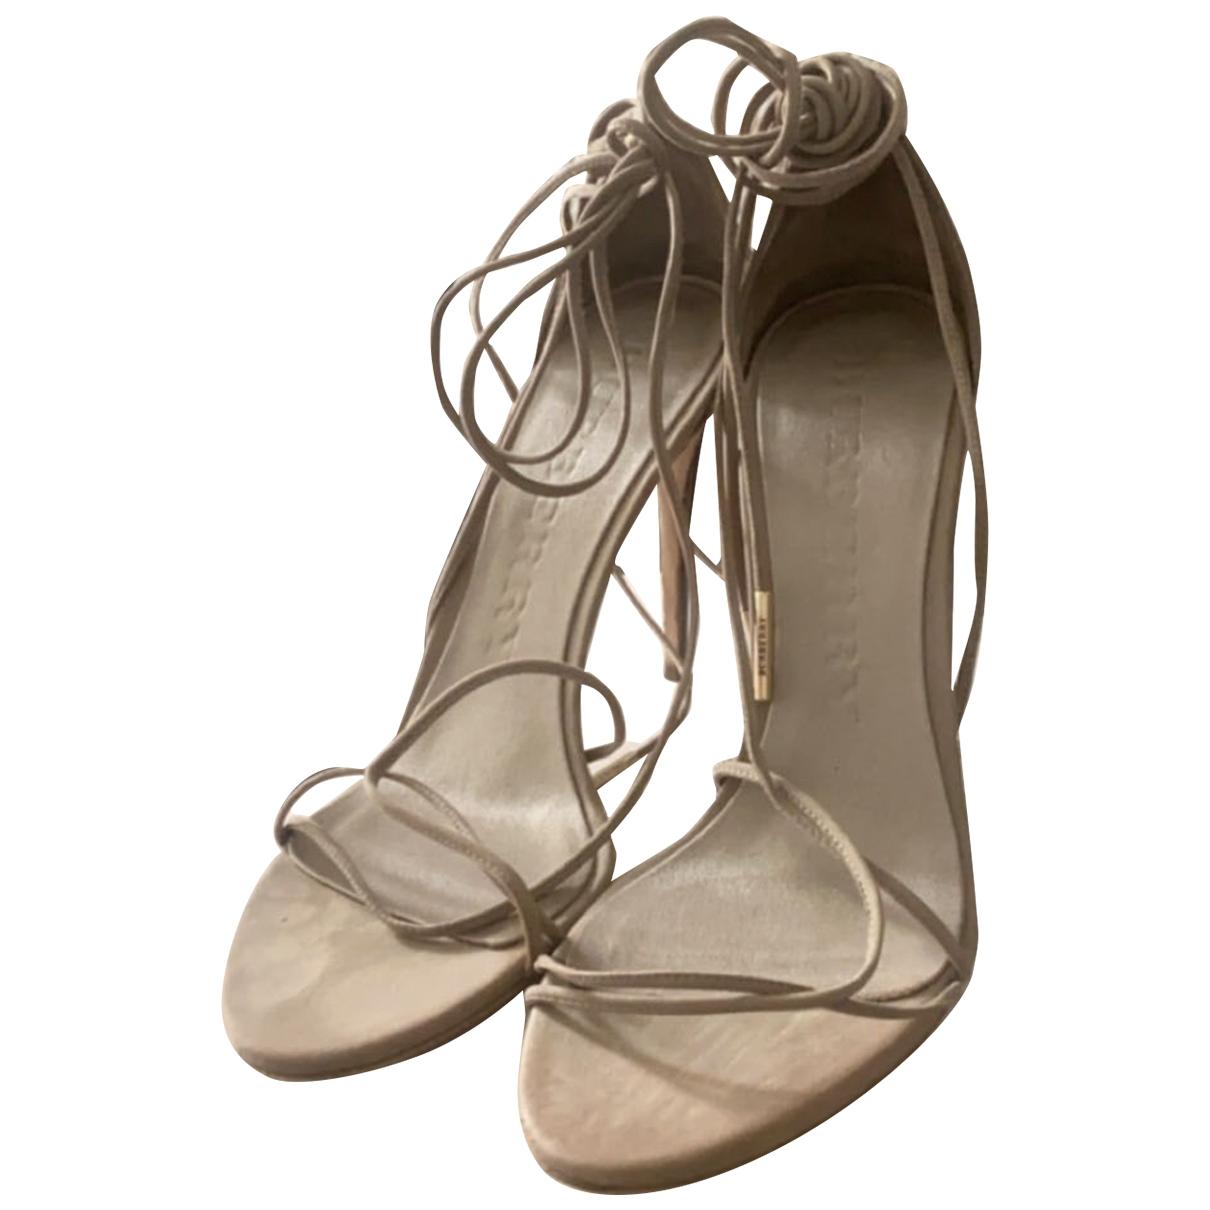 Burberry \N Beige Suede Sandals for Women 40 EU